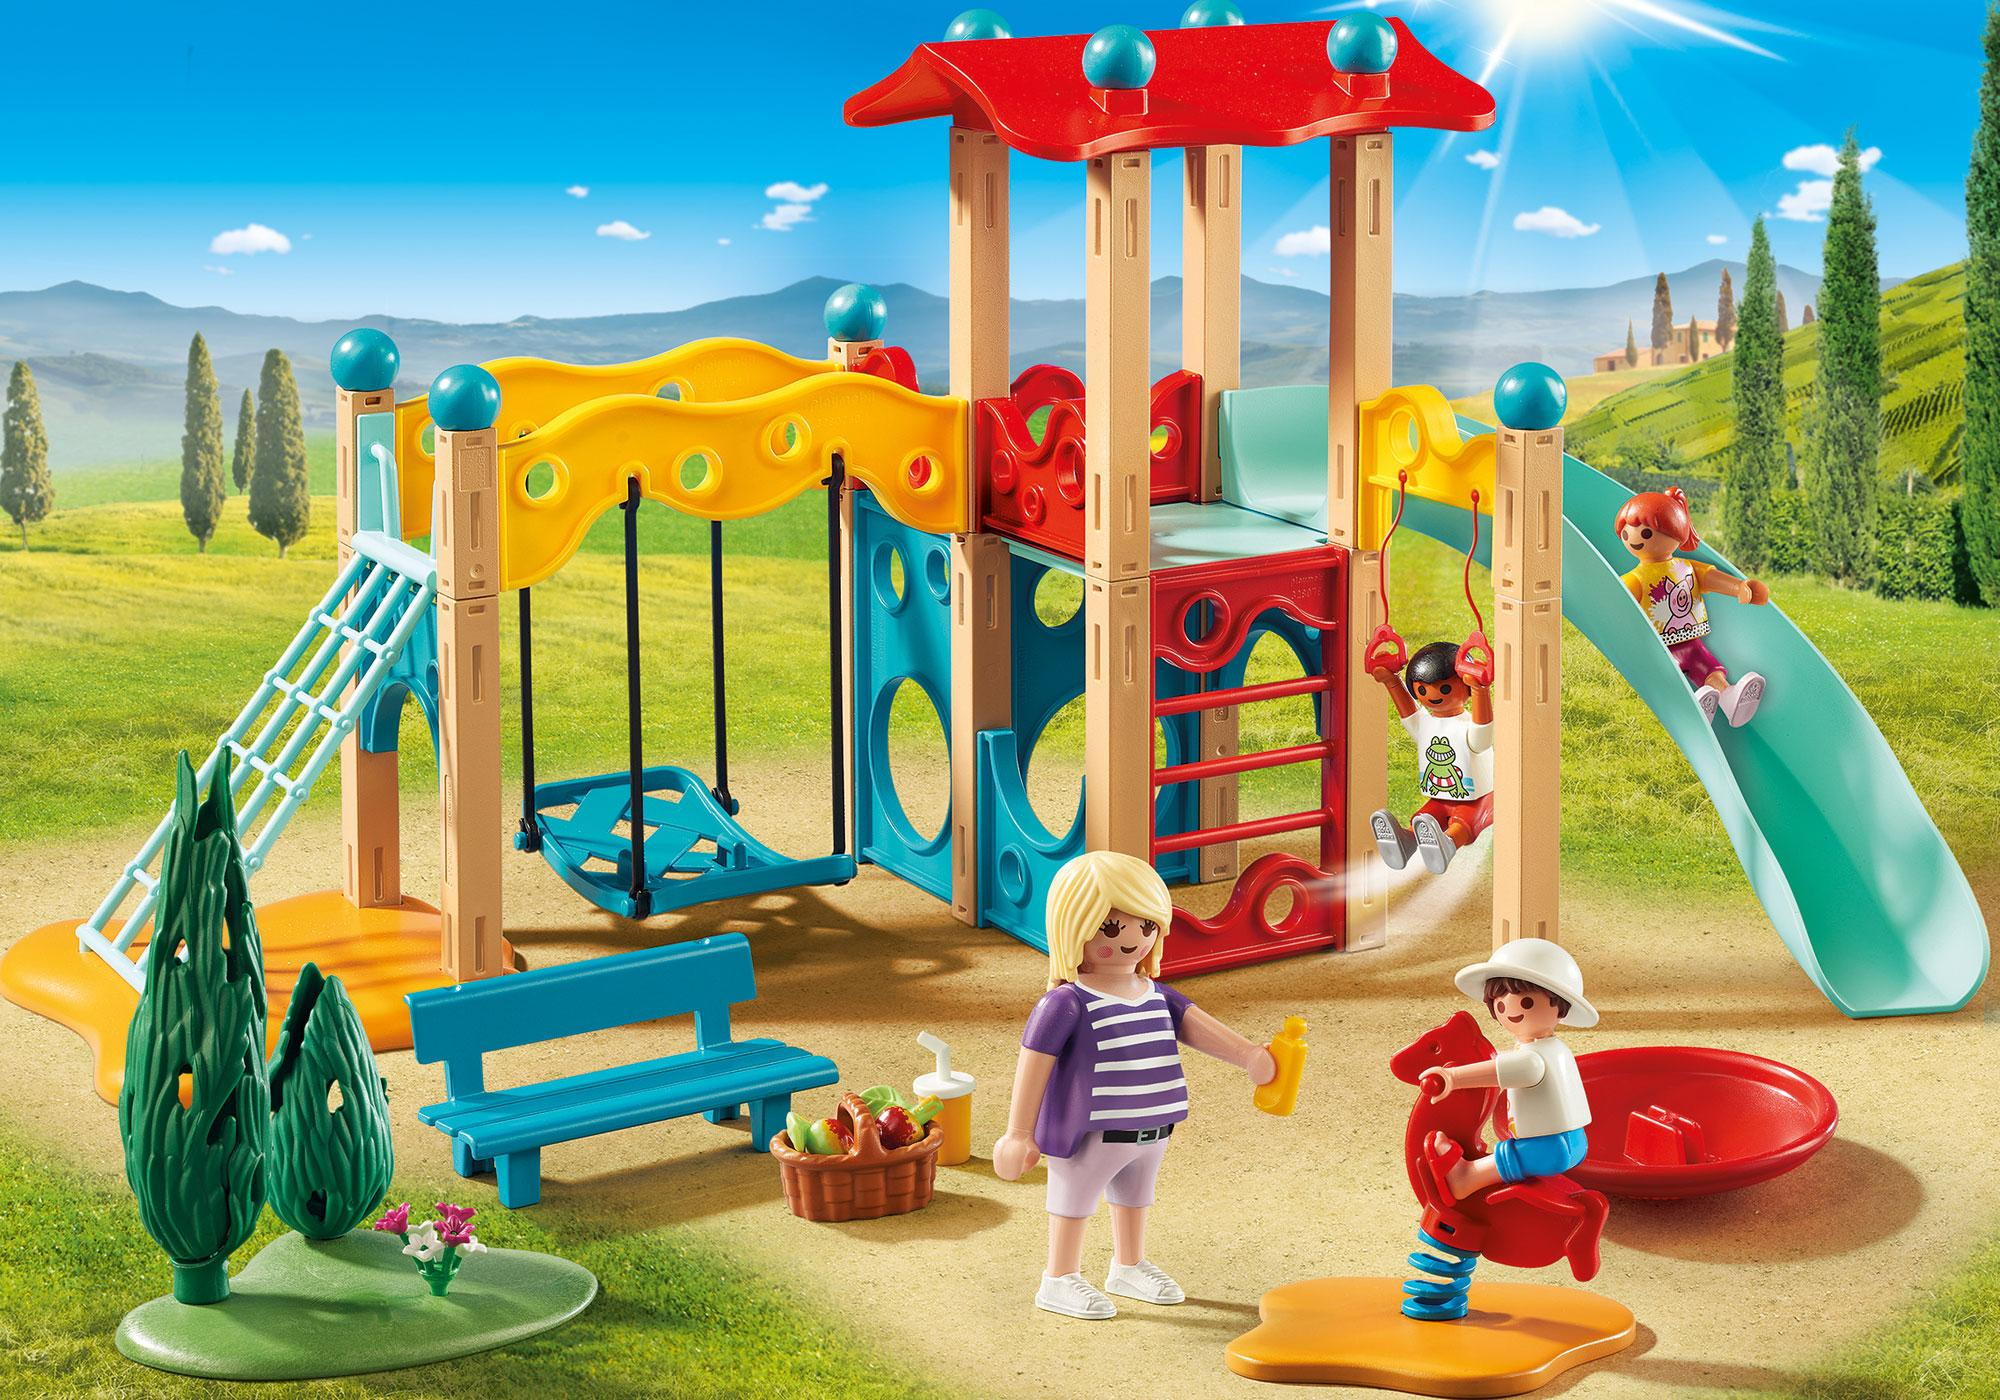 http://media.playmobil.com/i/playmobil/9423_product_detail/Parc de jeu avec toboggan